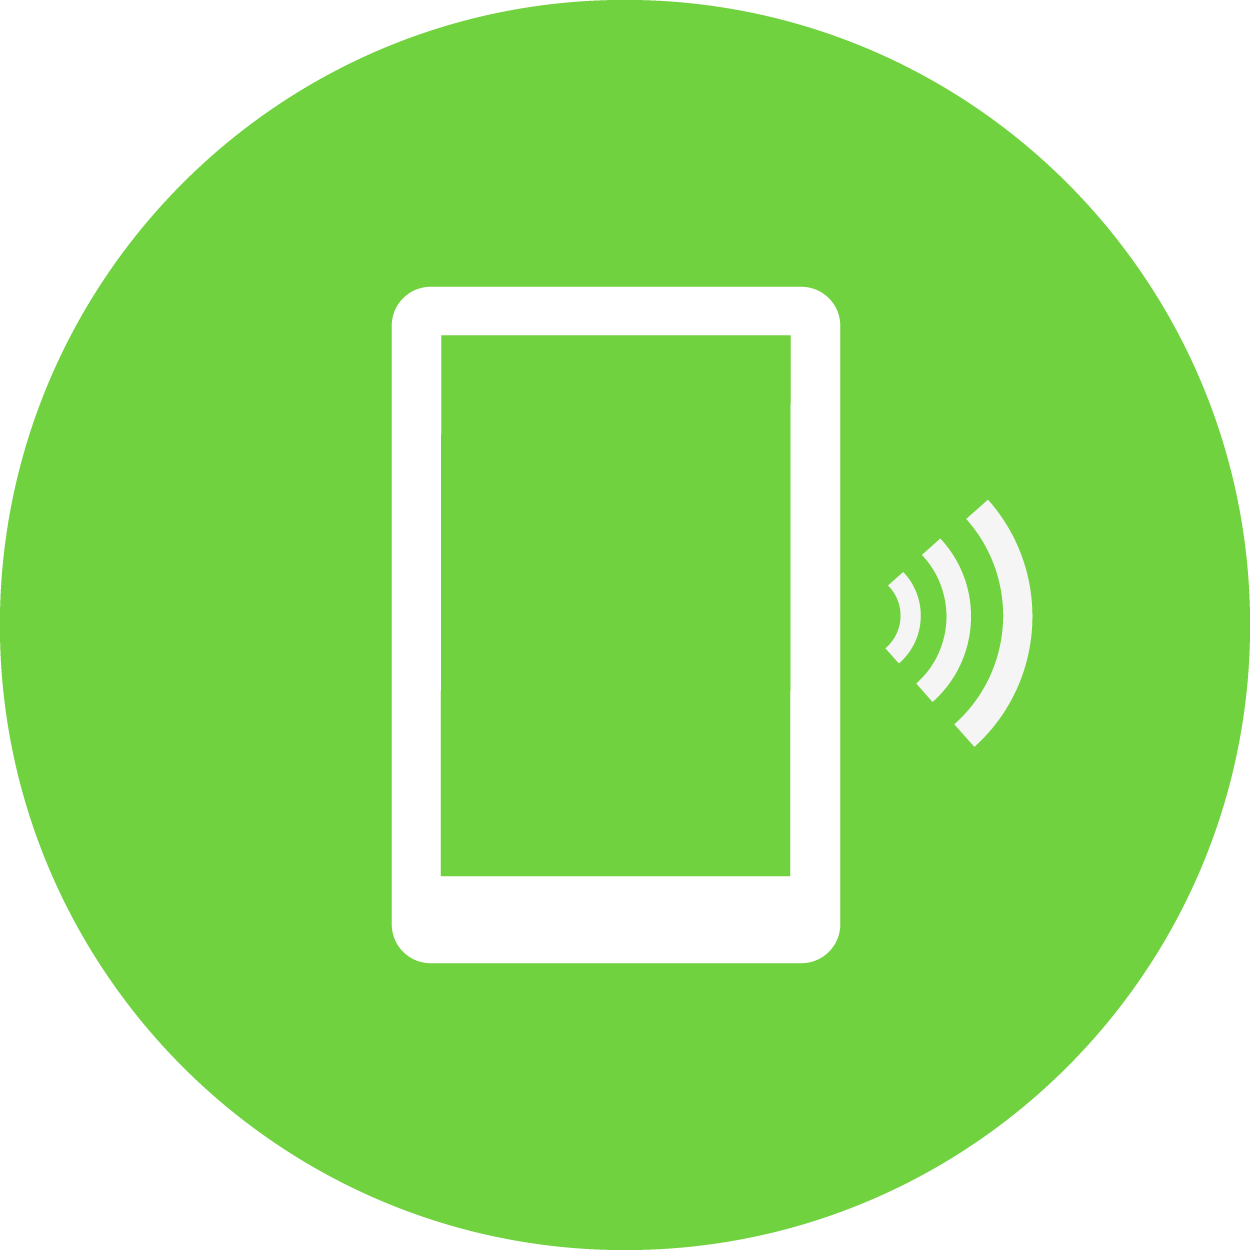 icona ricarica tramite smatphone